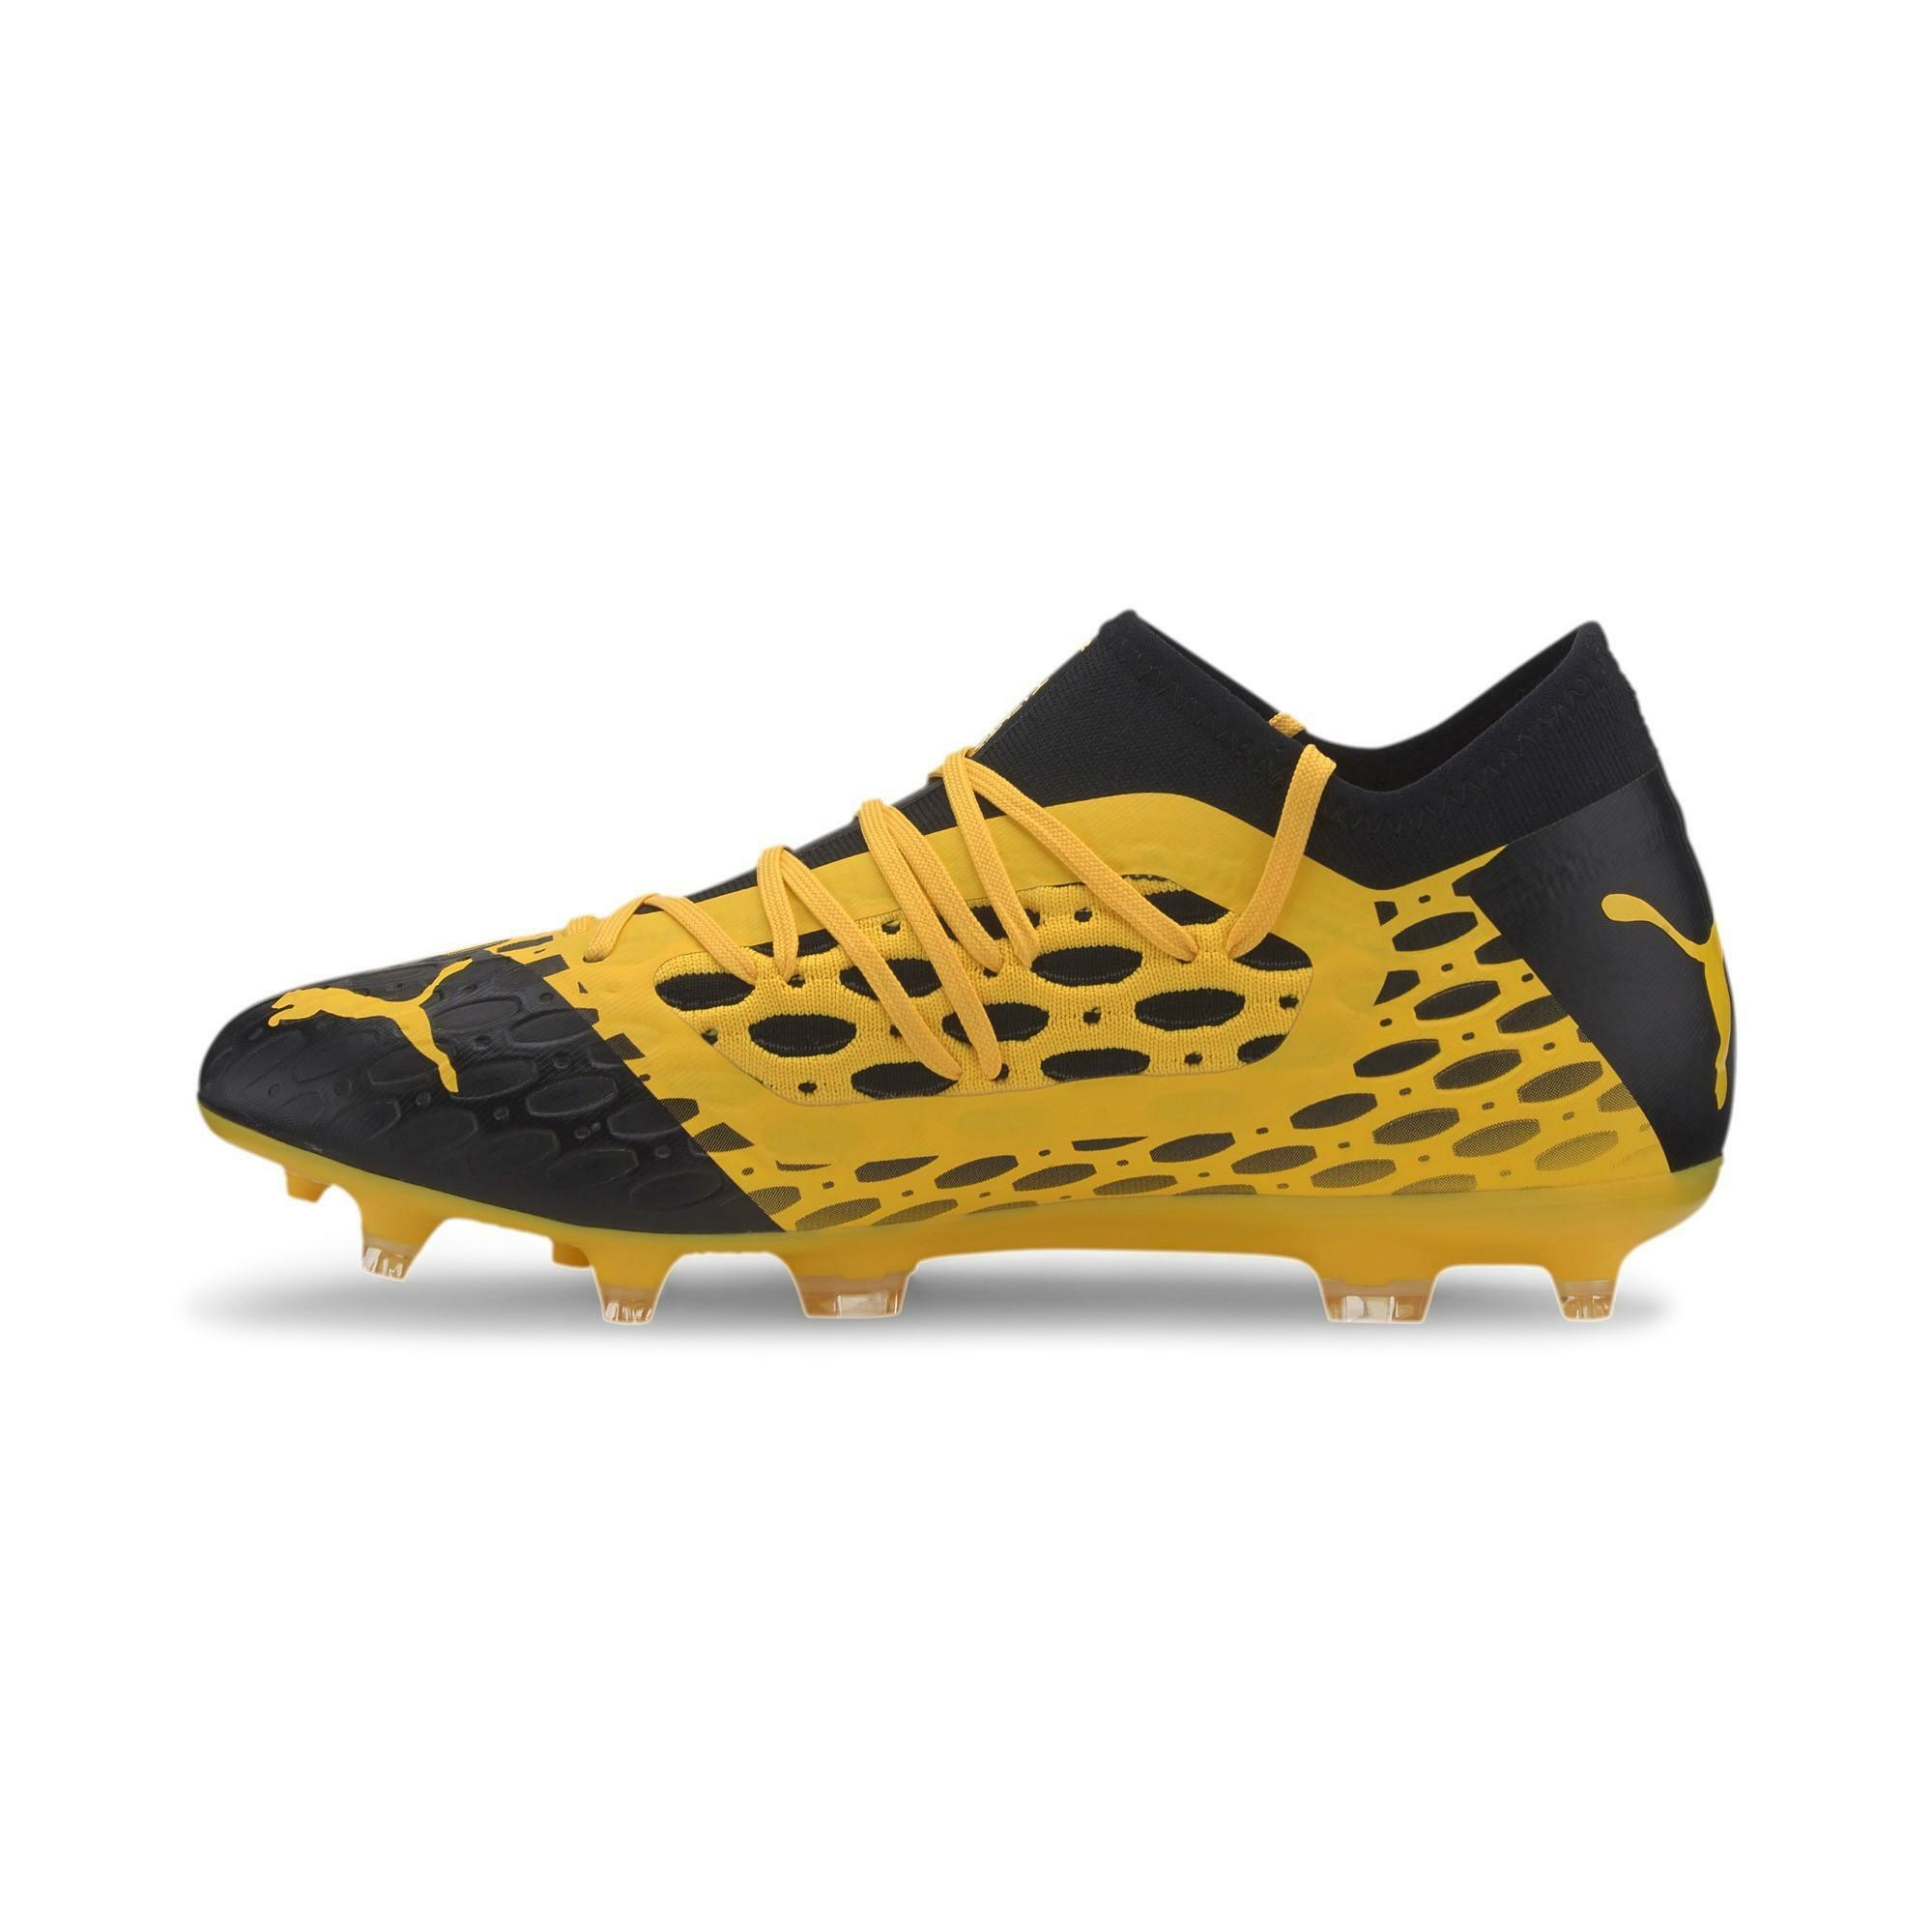 puma puma scarpa calcio future 5.3 netfit fg